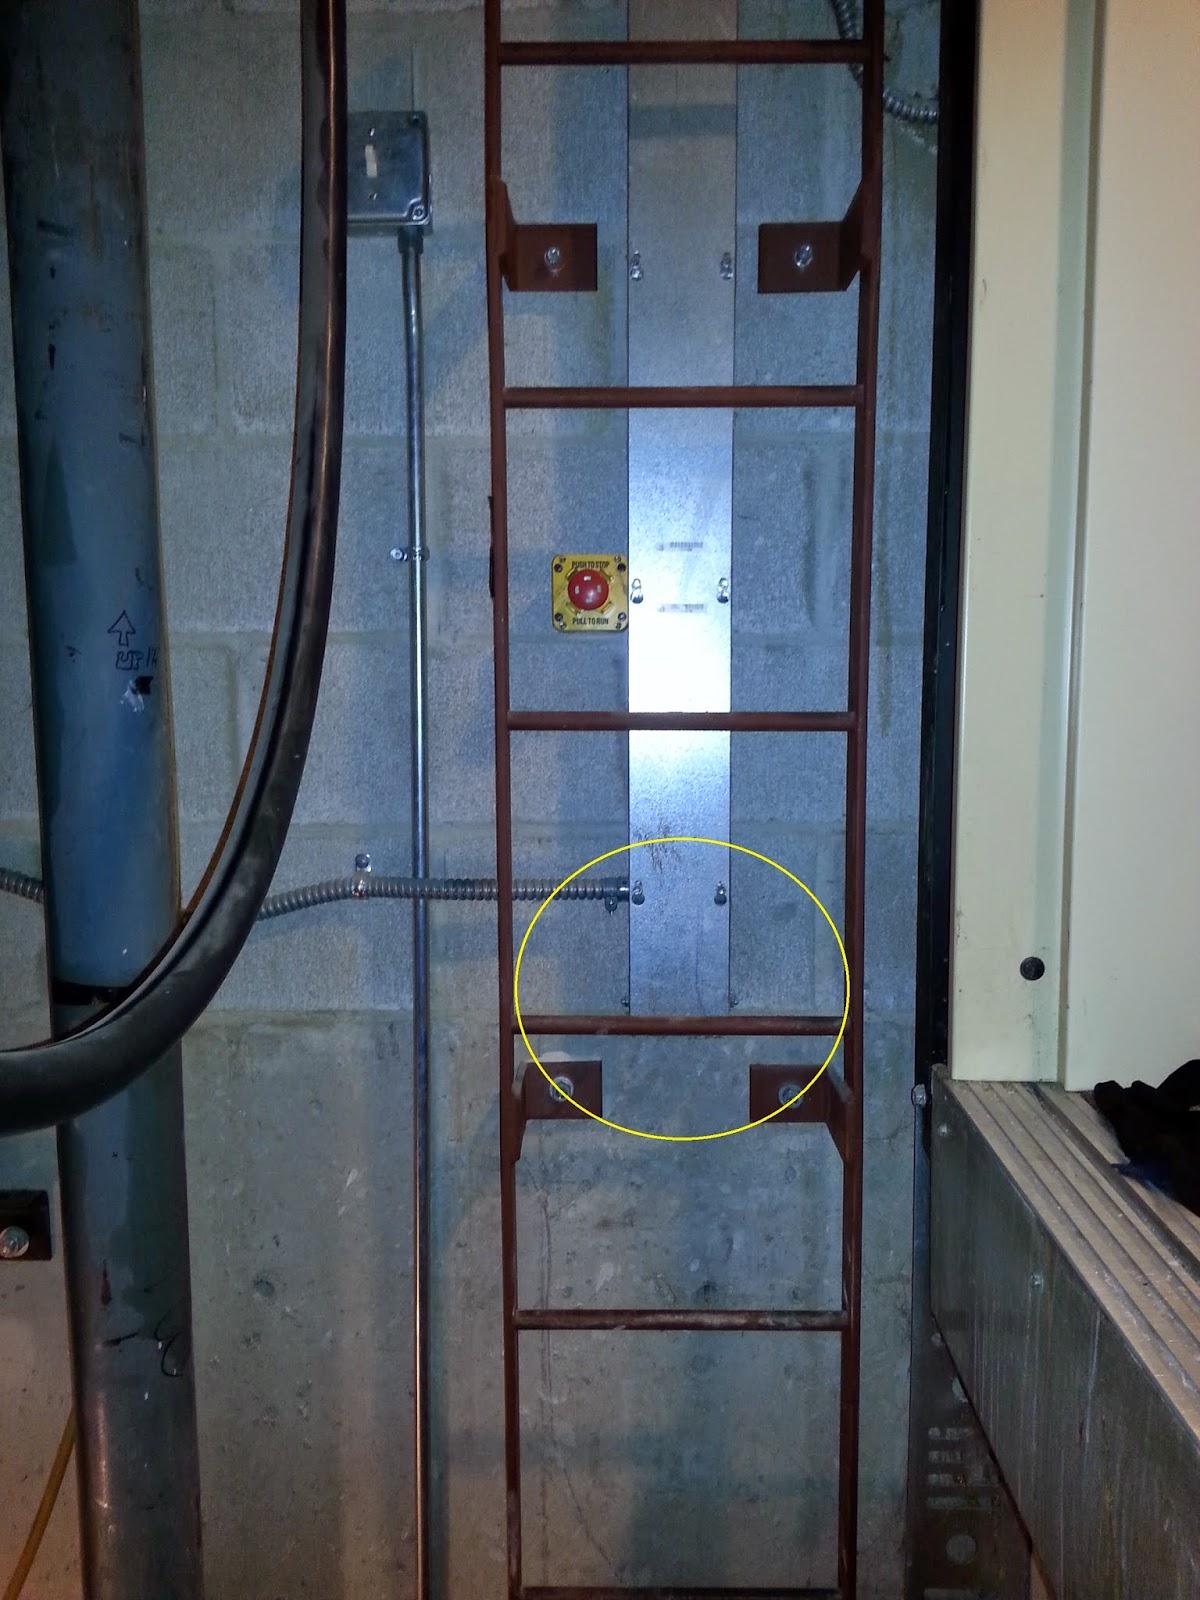 Otis Elevator Mechanic